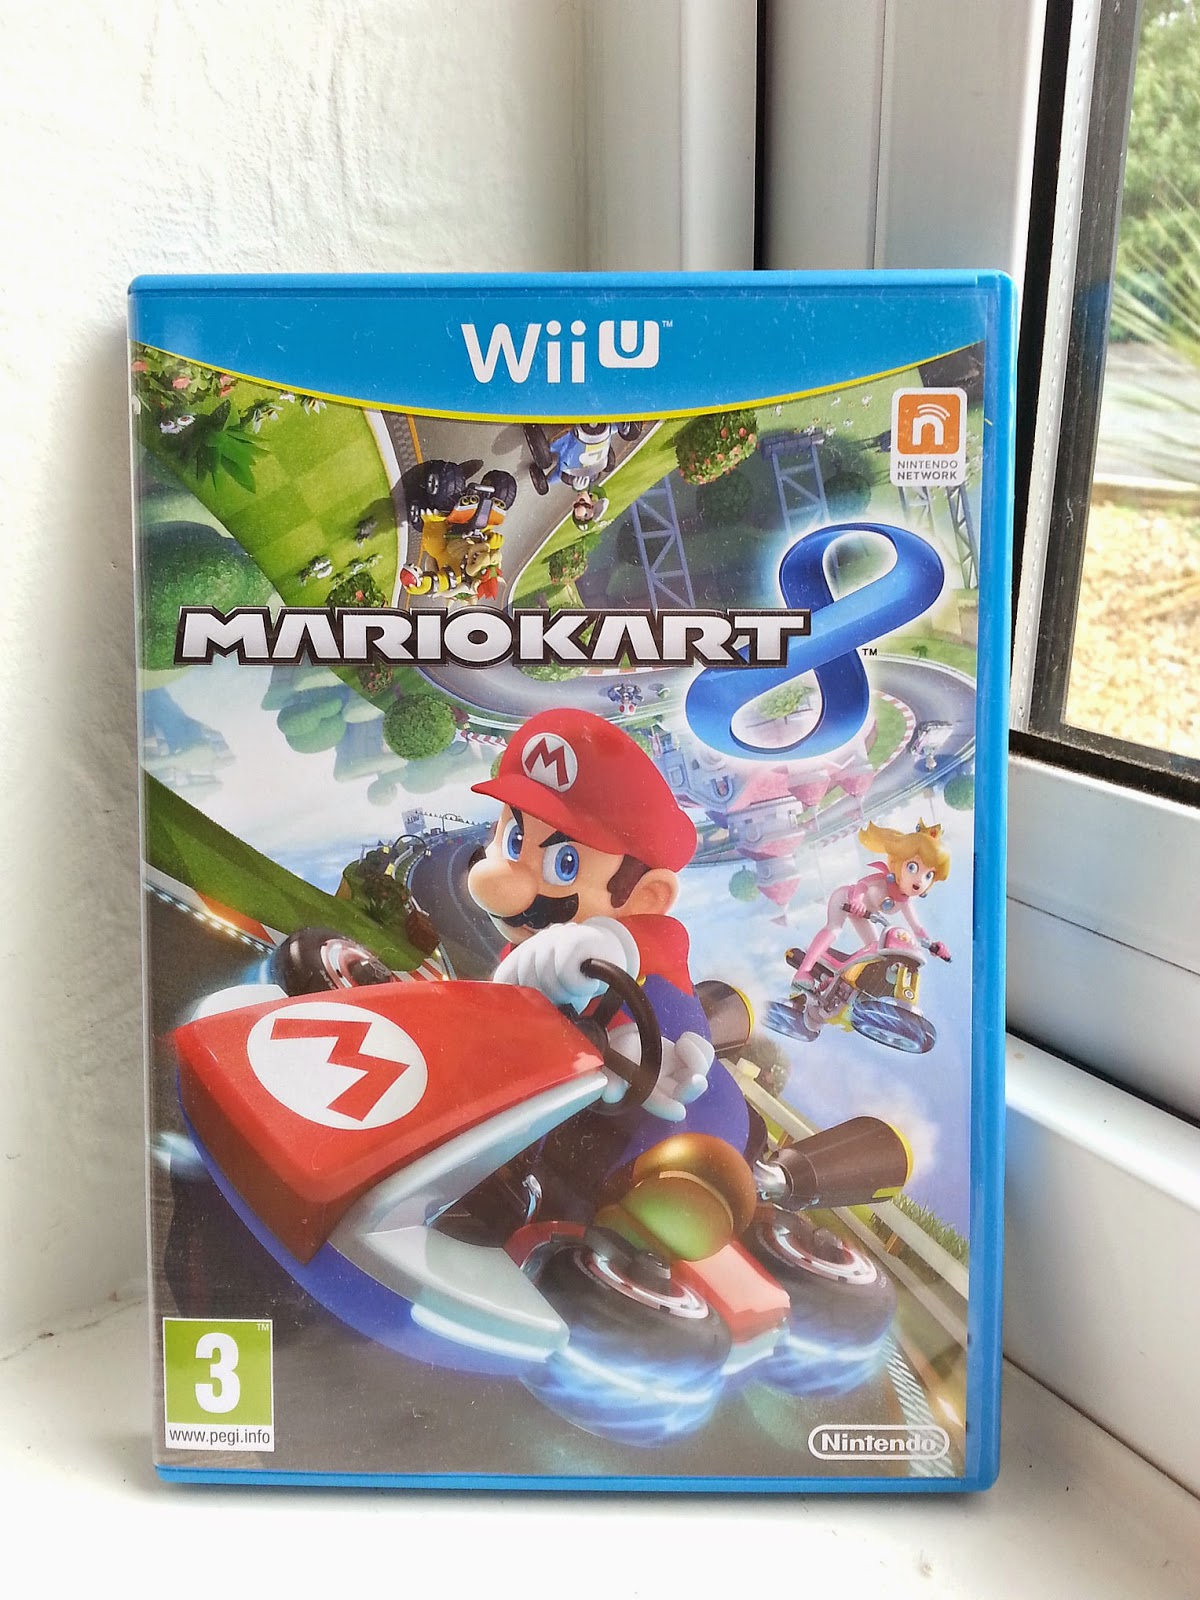 Mario Kart 8, Mario Kart 8 Challenge, Mario Kart 8 review